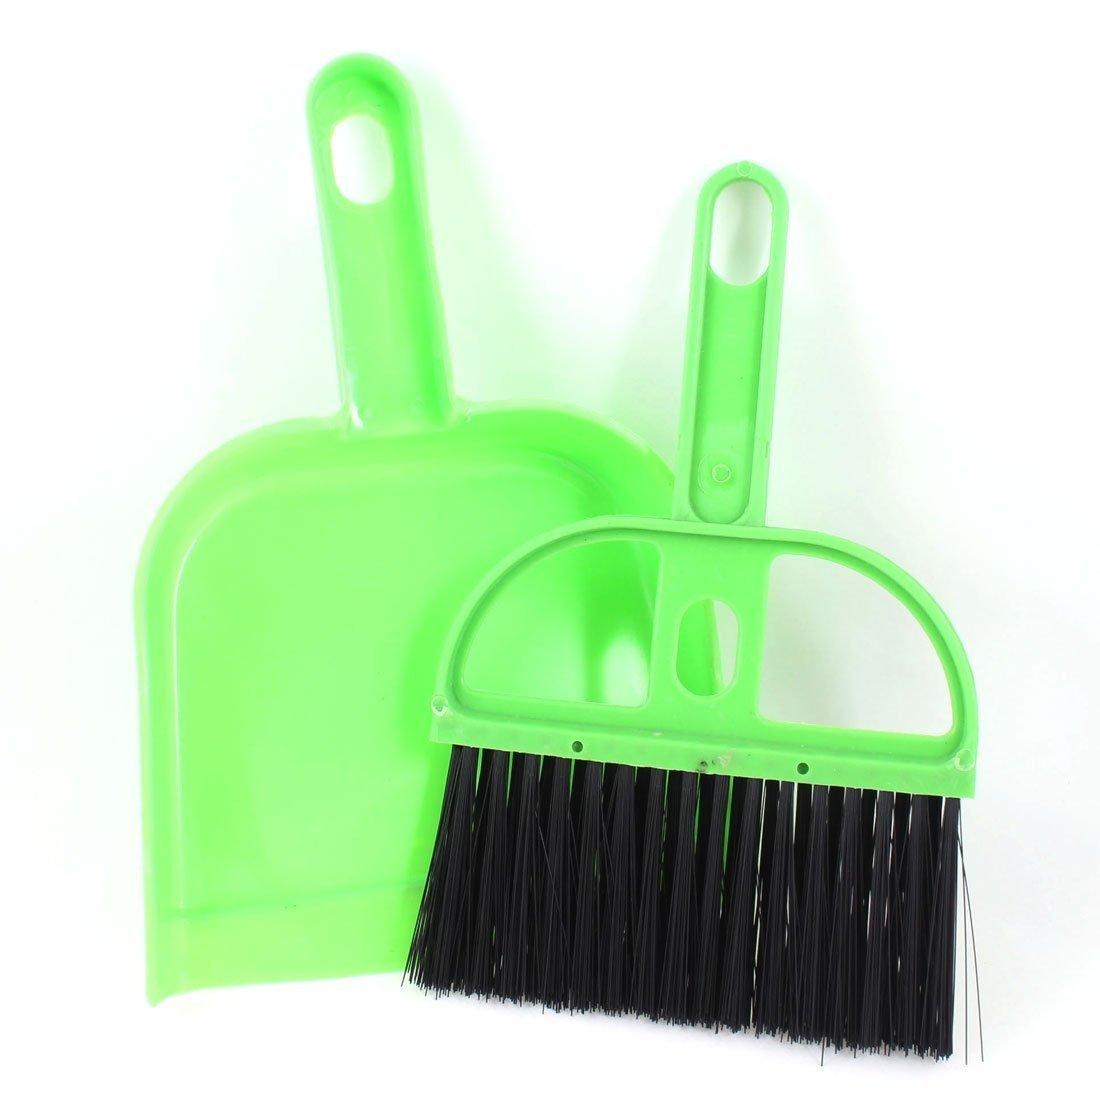 Home Mart Office Home Car Cleaning Mini Whisk Broom Dustpan Set Green Black